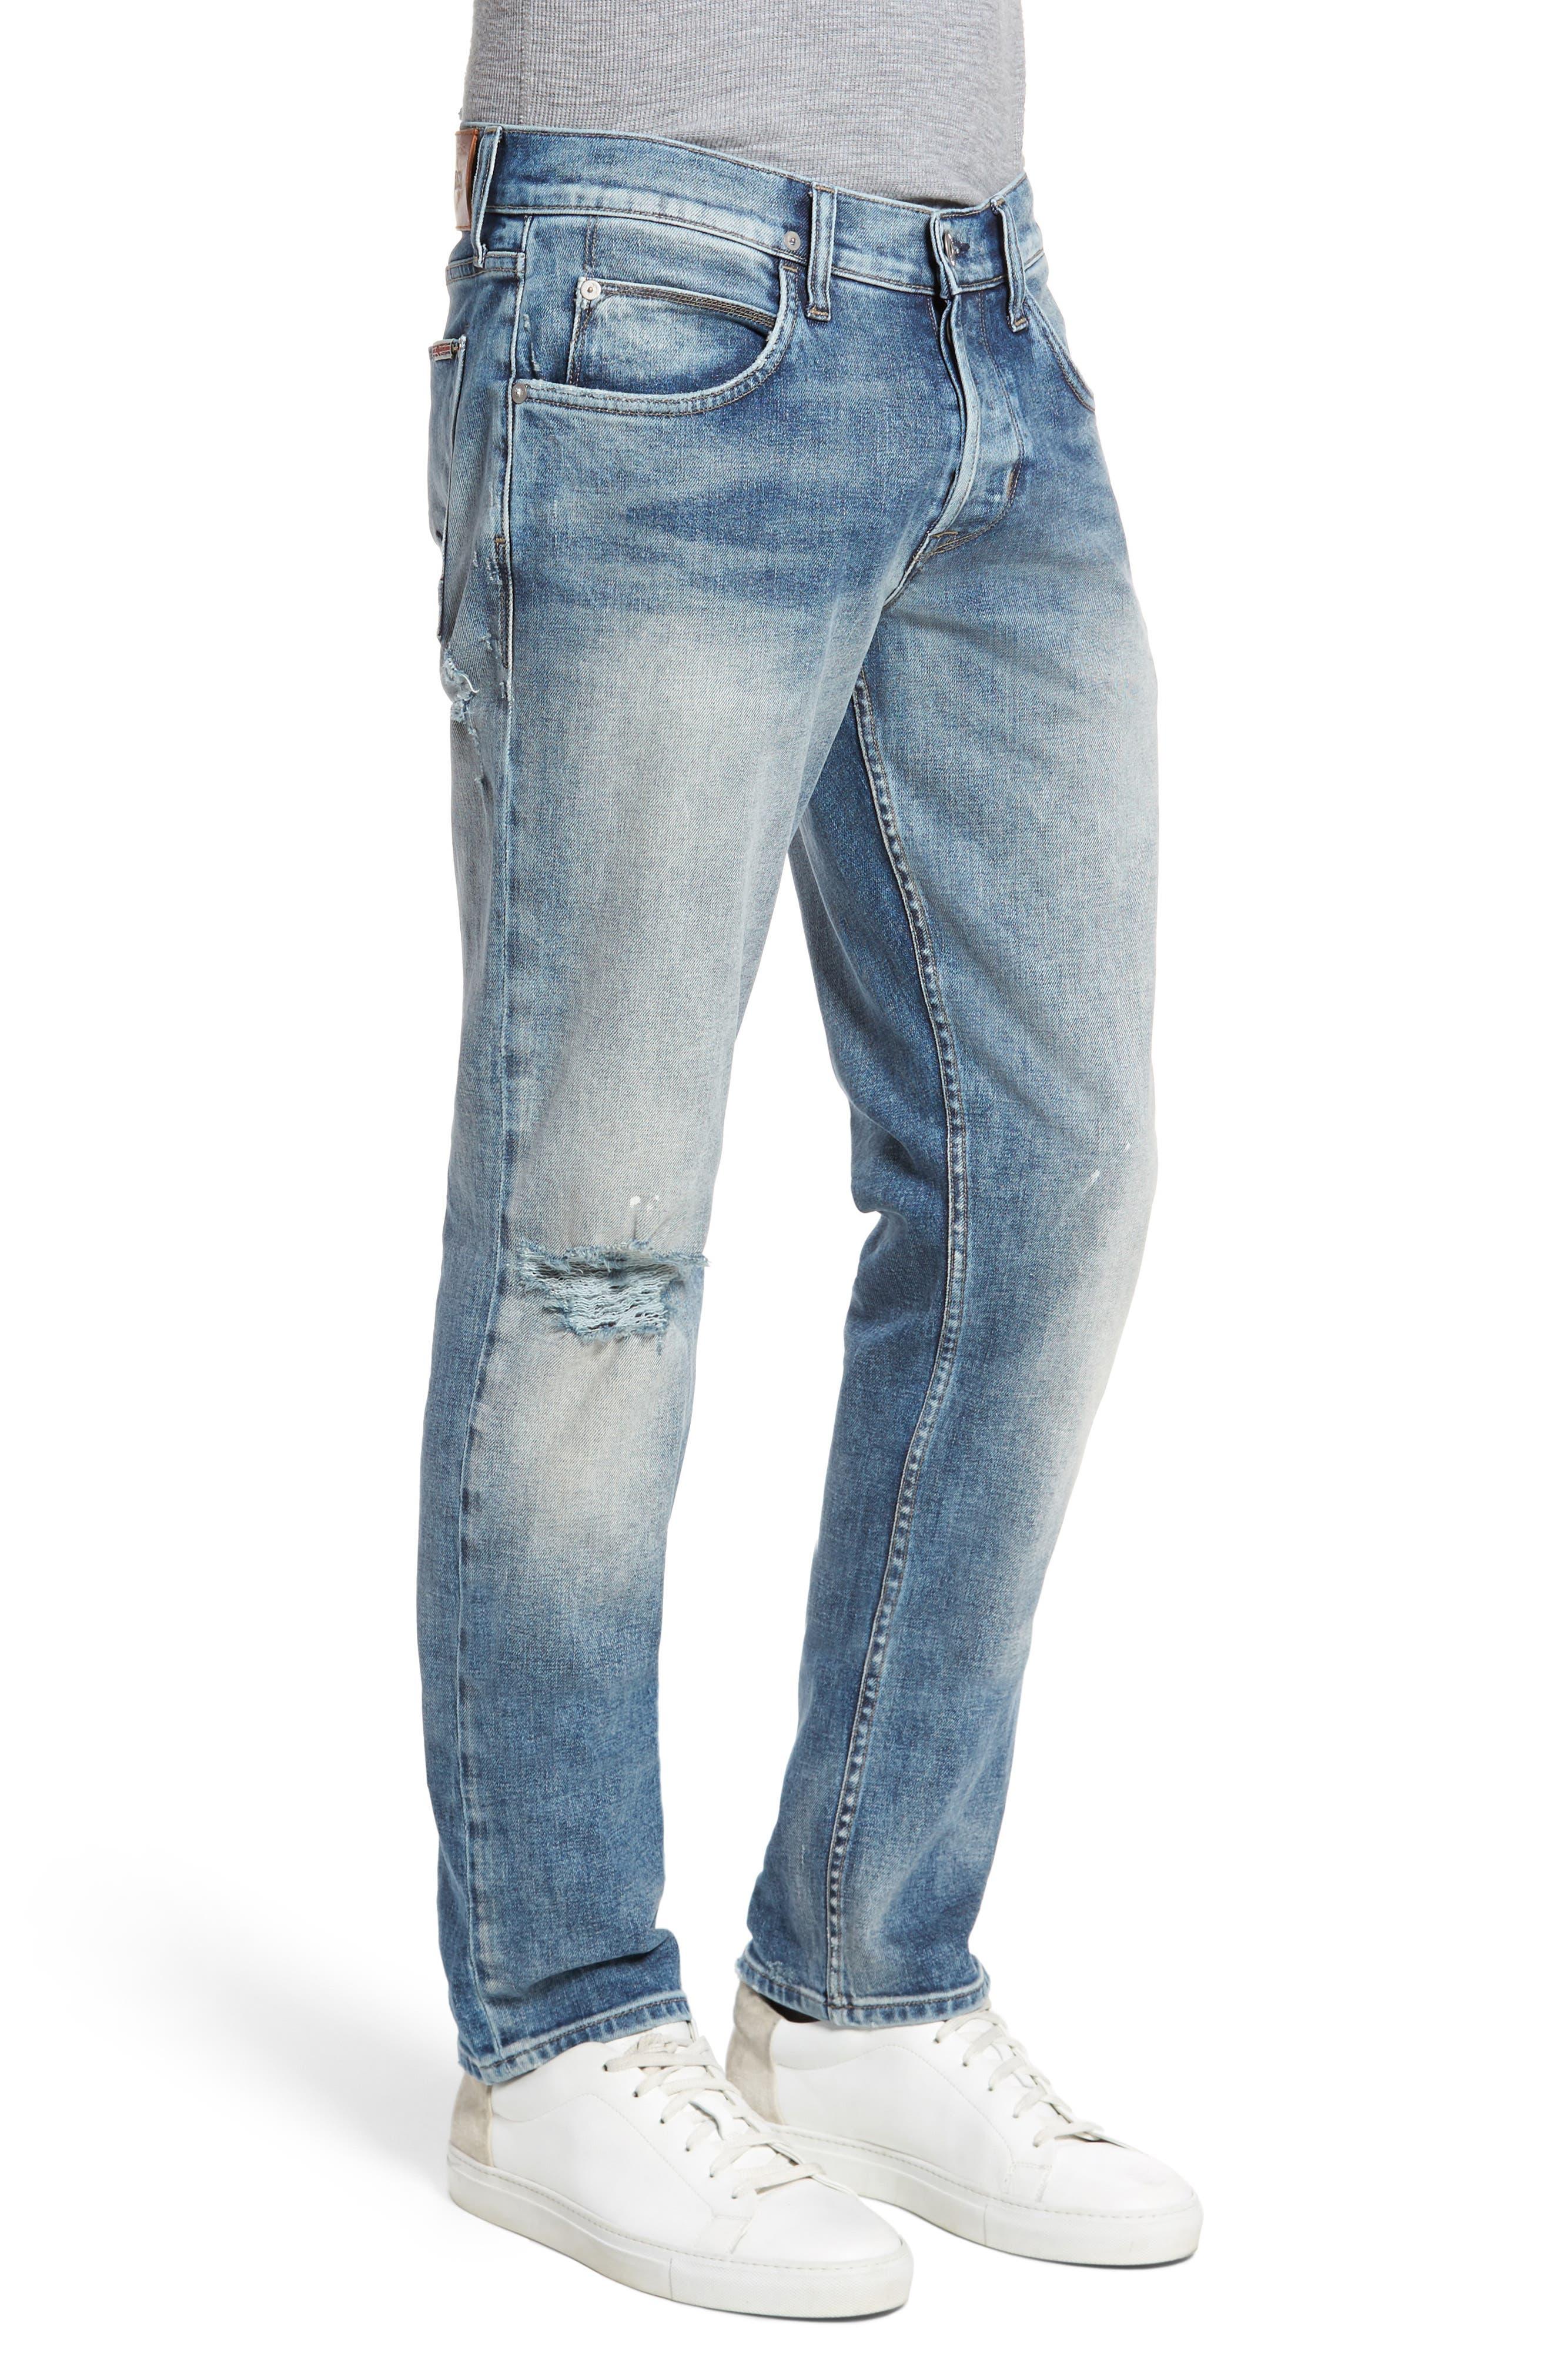 Blake Slim Fit Jeans,                             Alternate thumbnail 3, color,                             Lockwood